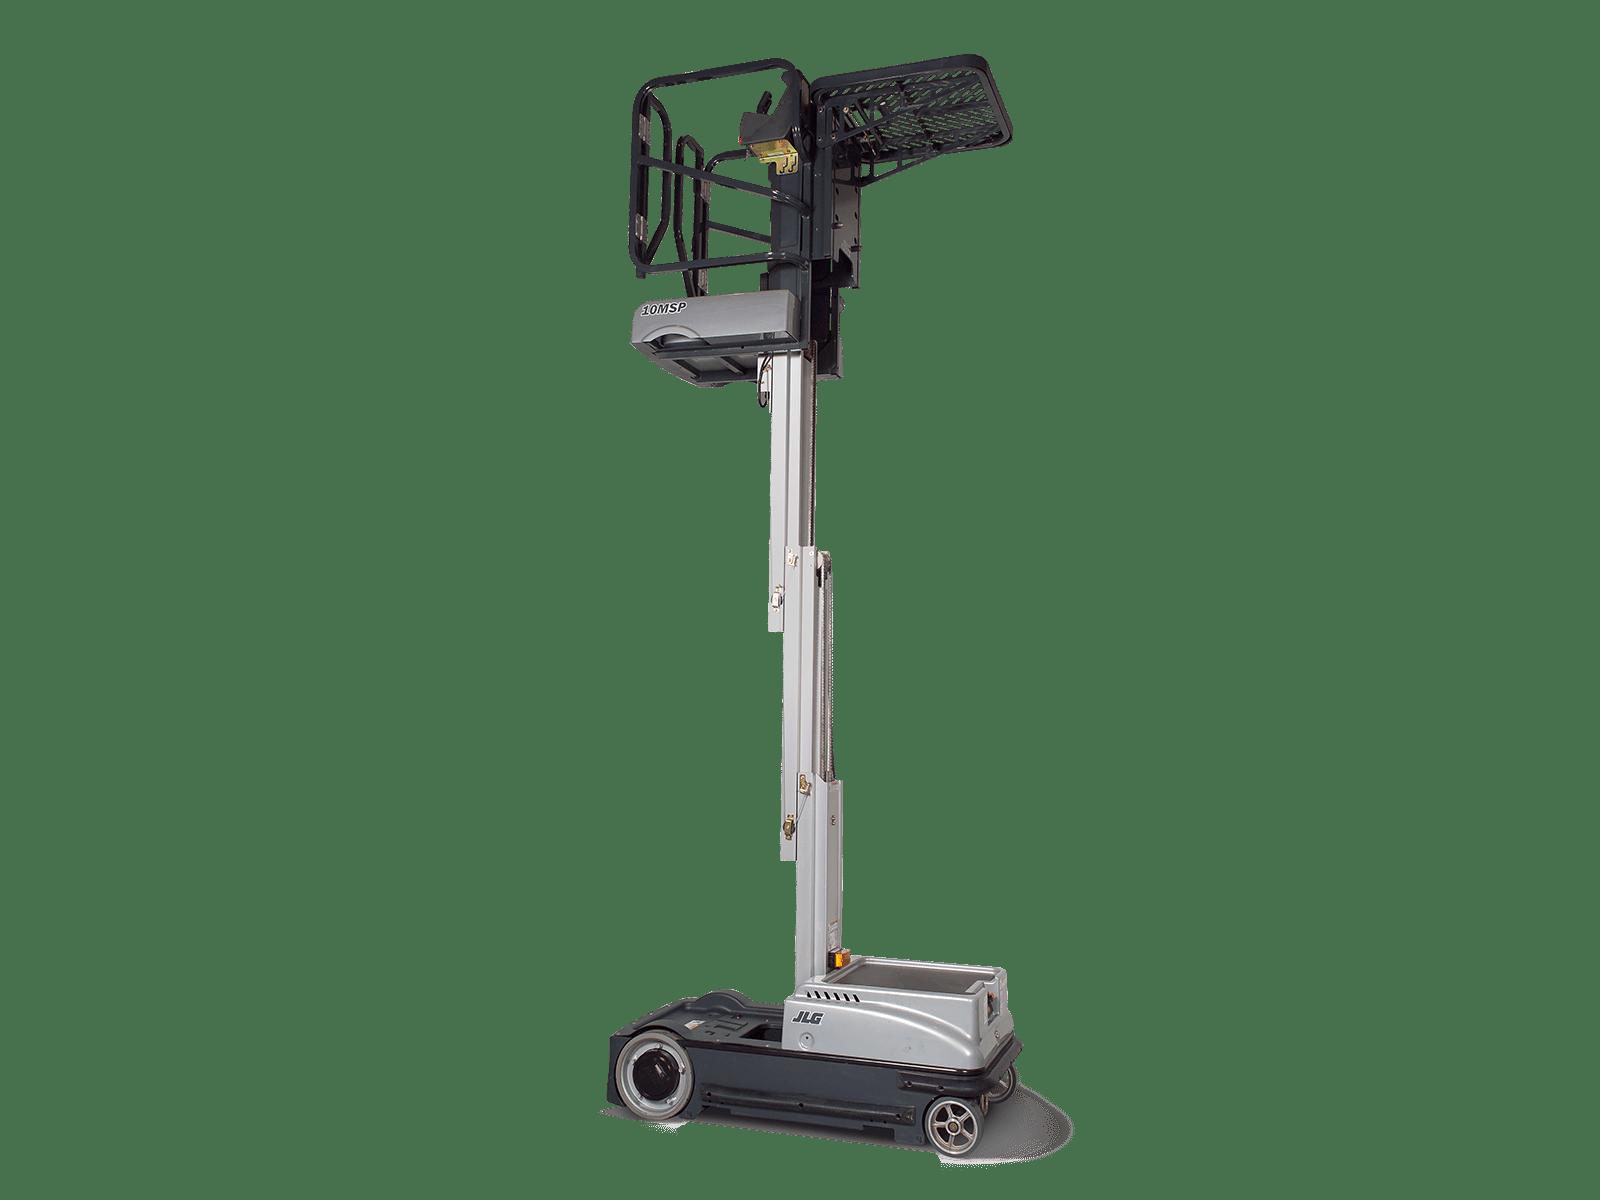 10MSP Driveable Stock Picker Vertical Mast Lift | JLG